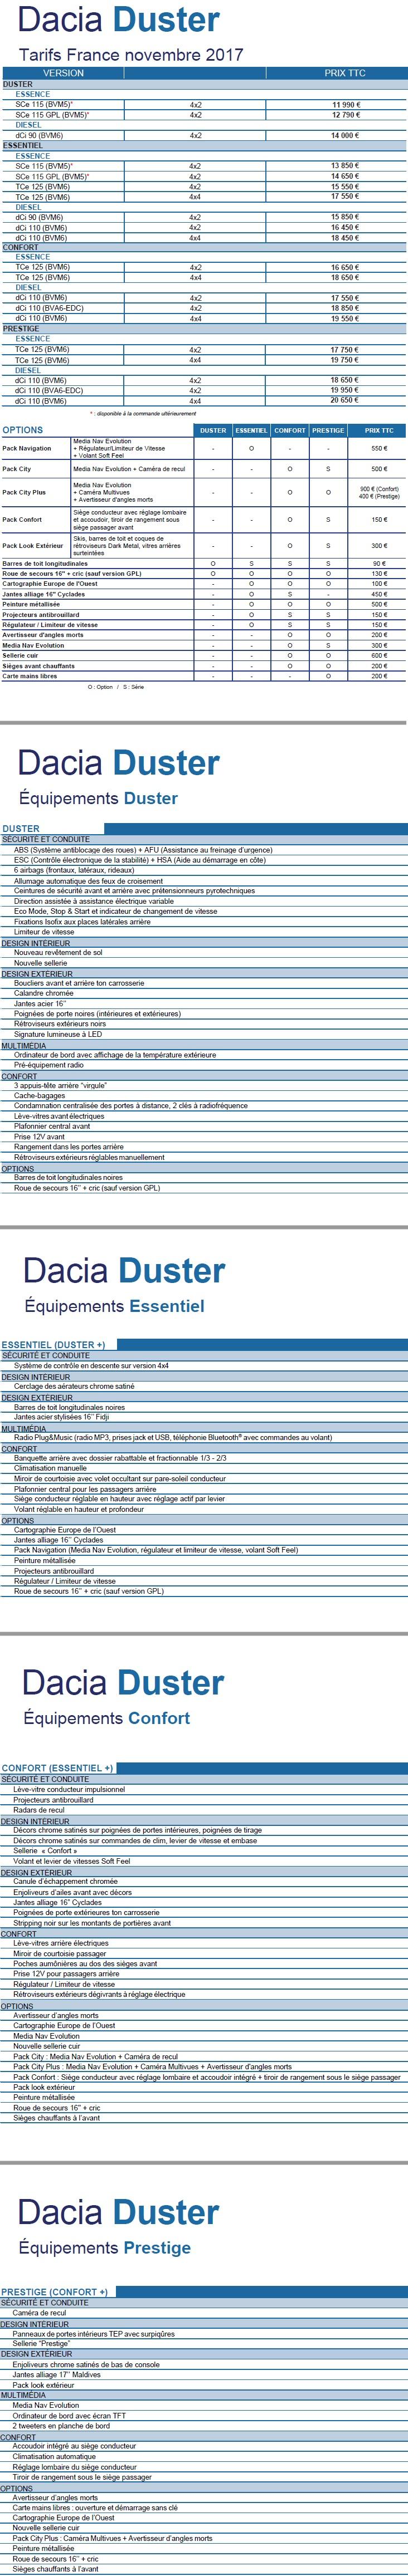 Nouveau Dacia Duster : un prix toujours aussi imbattable ! 244597DaciaDustertarifsfrancenovembre2017